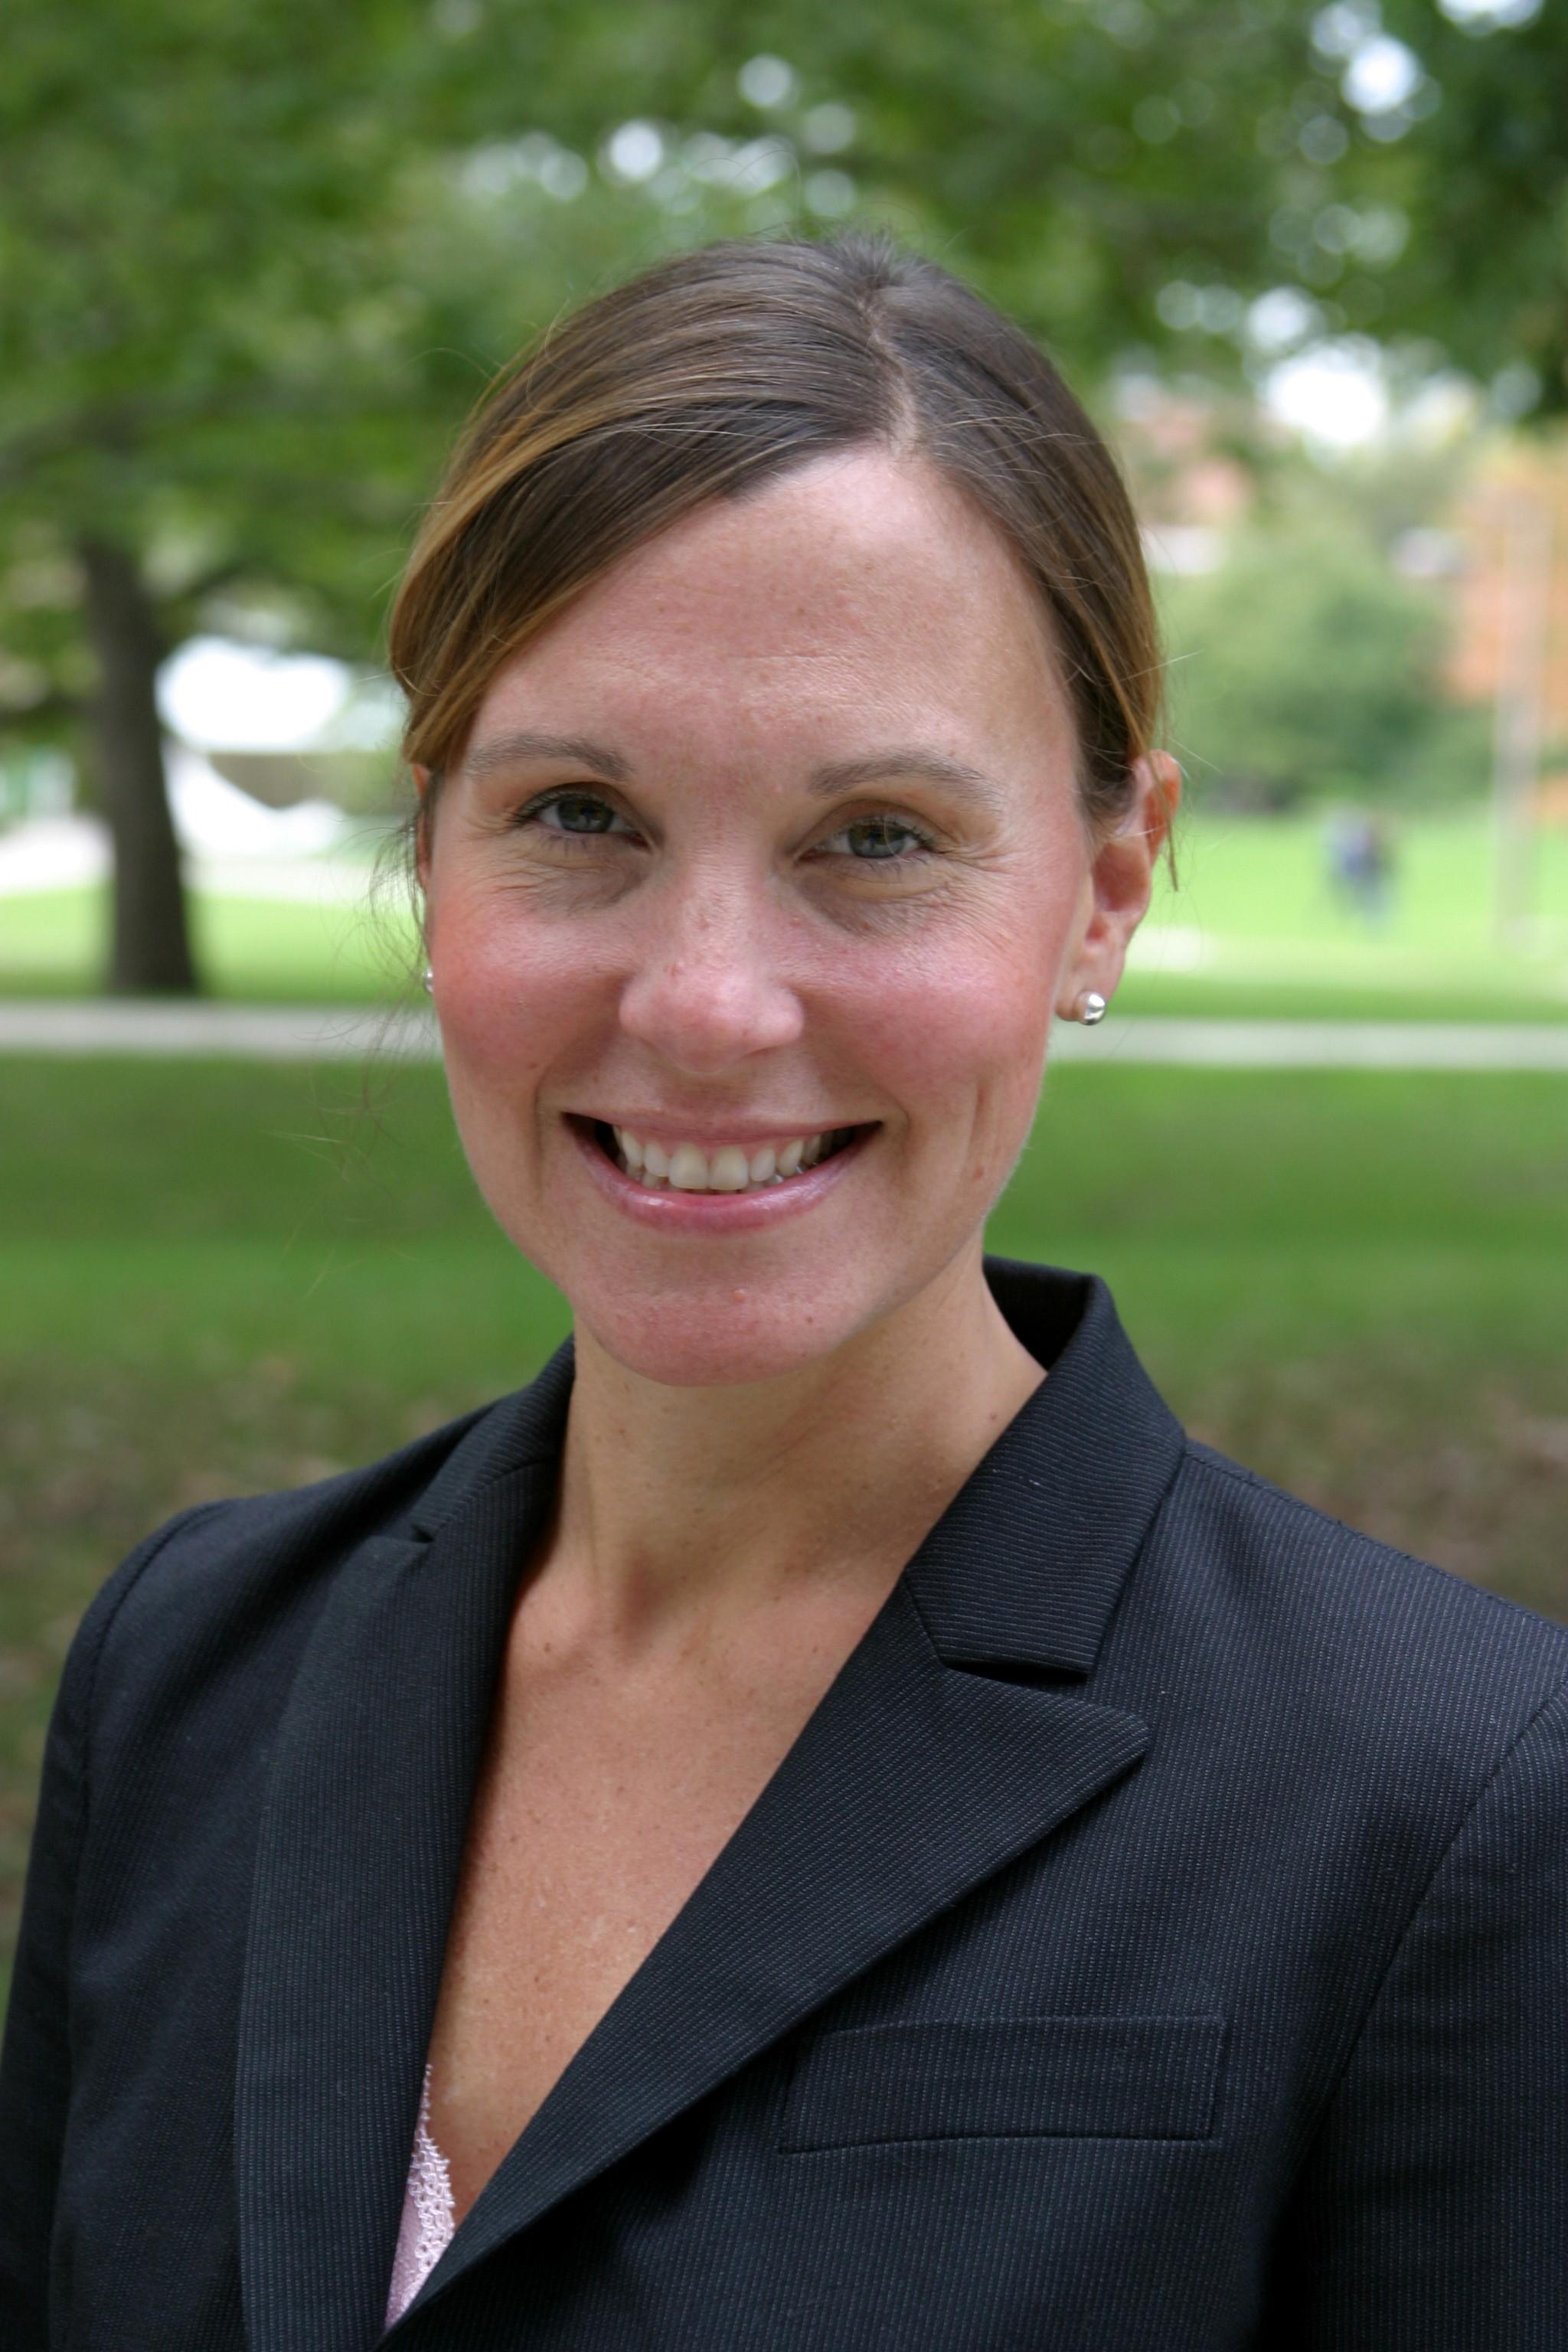 Janine Certo Msutoday Michigan State University